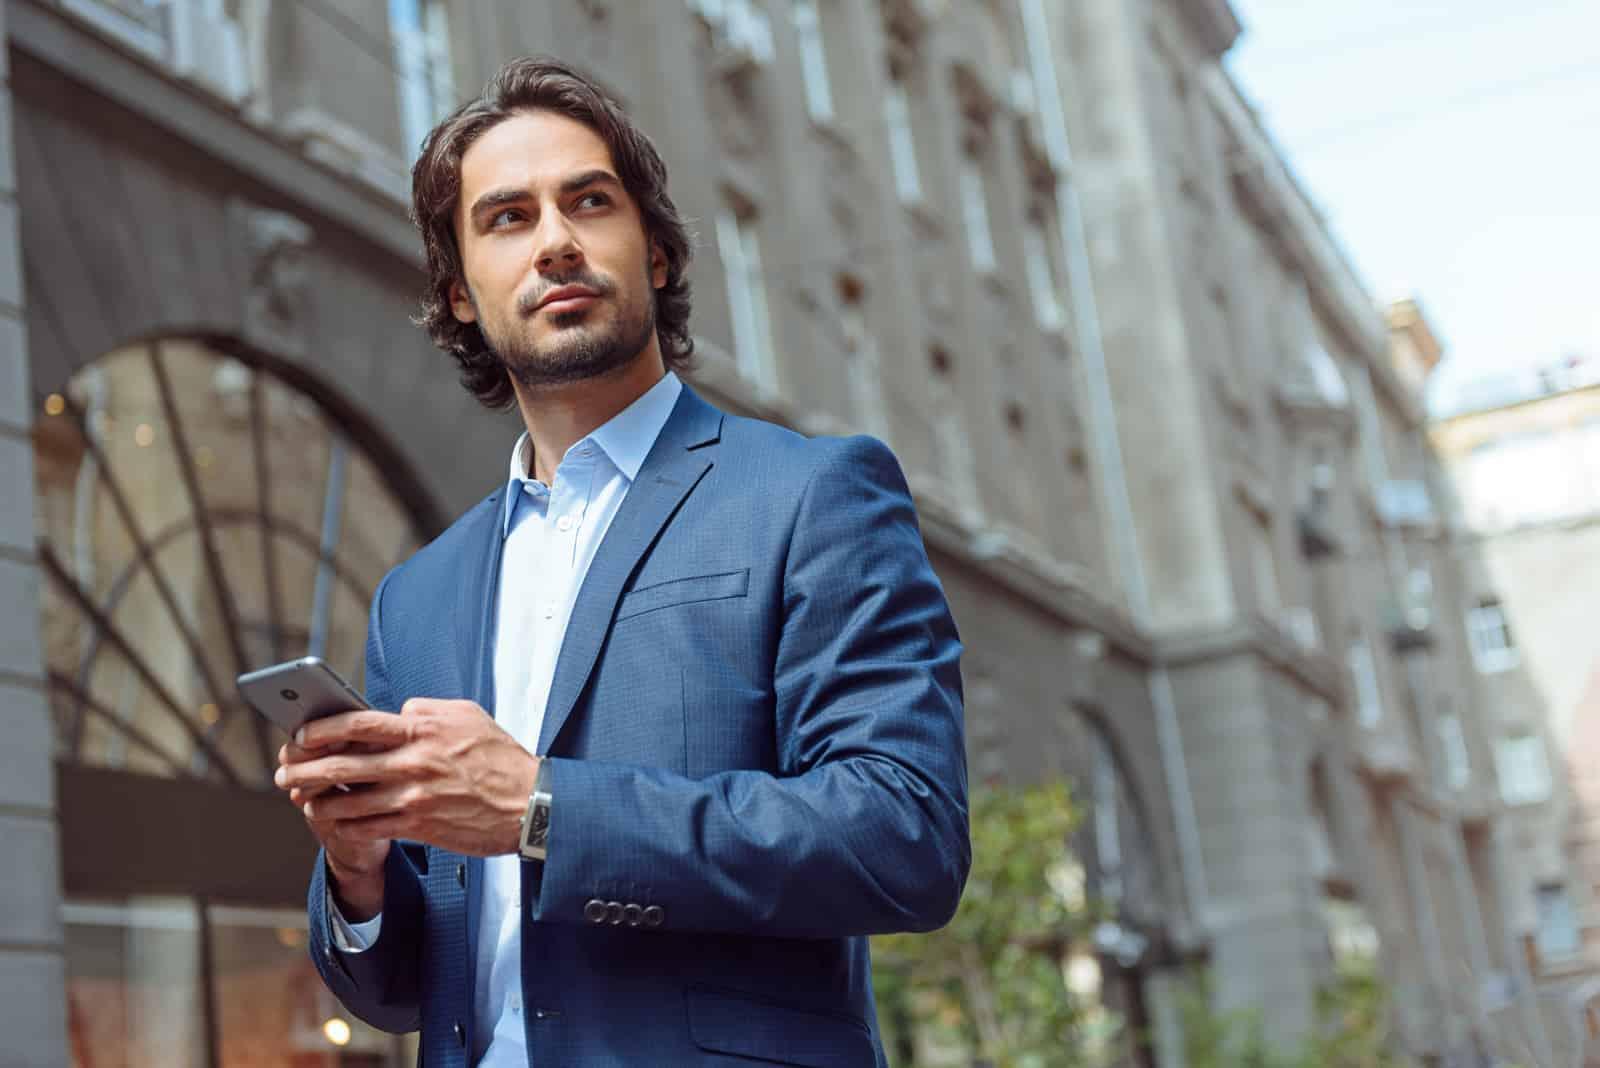 Cheerful businessman holding telephone